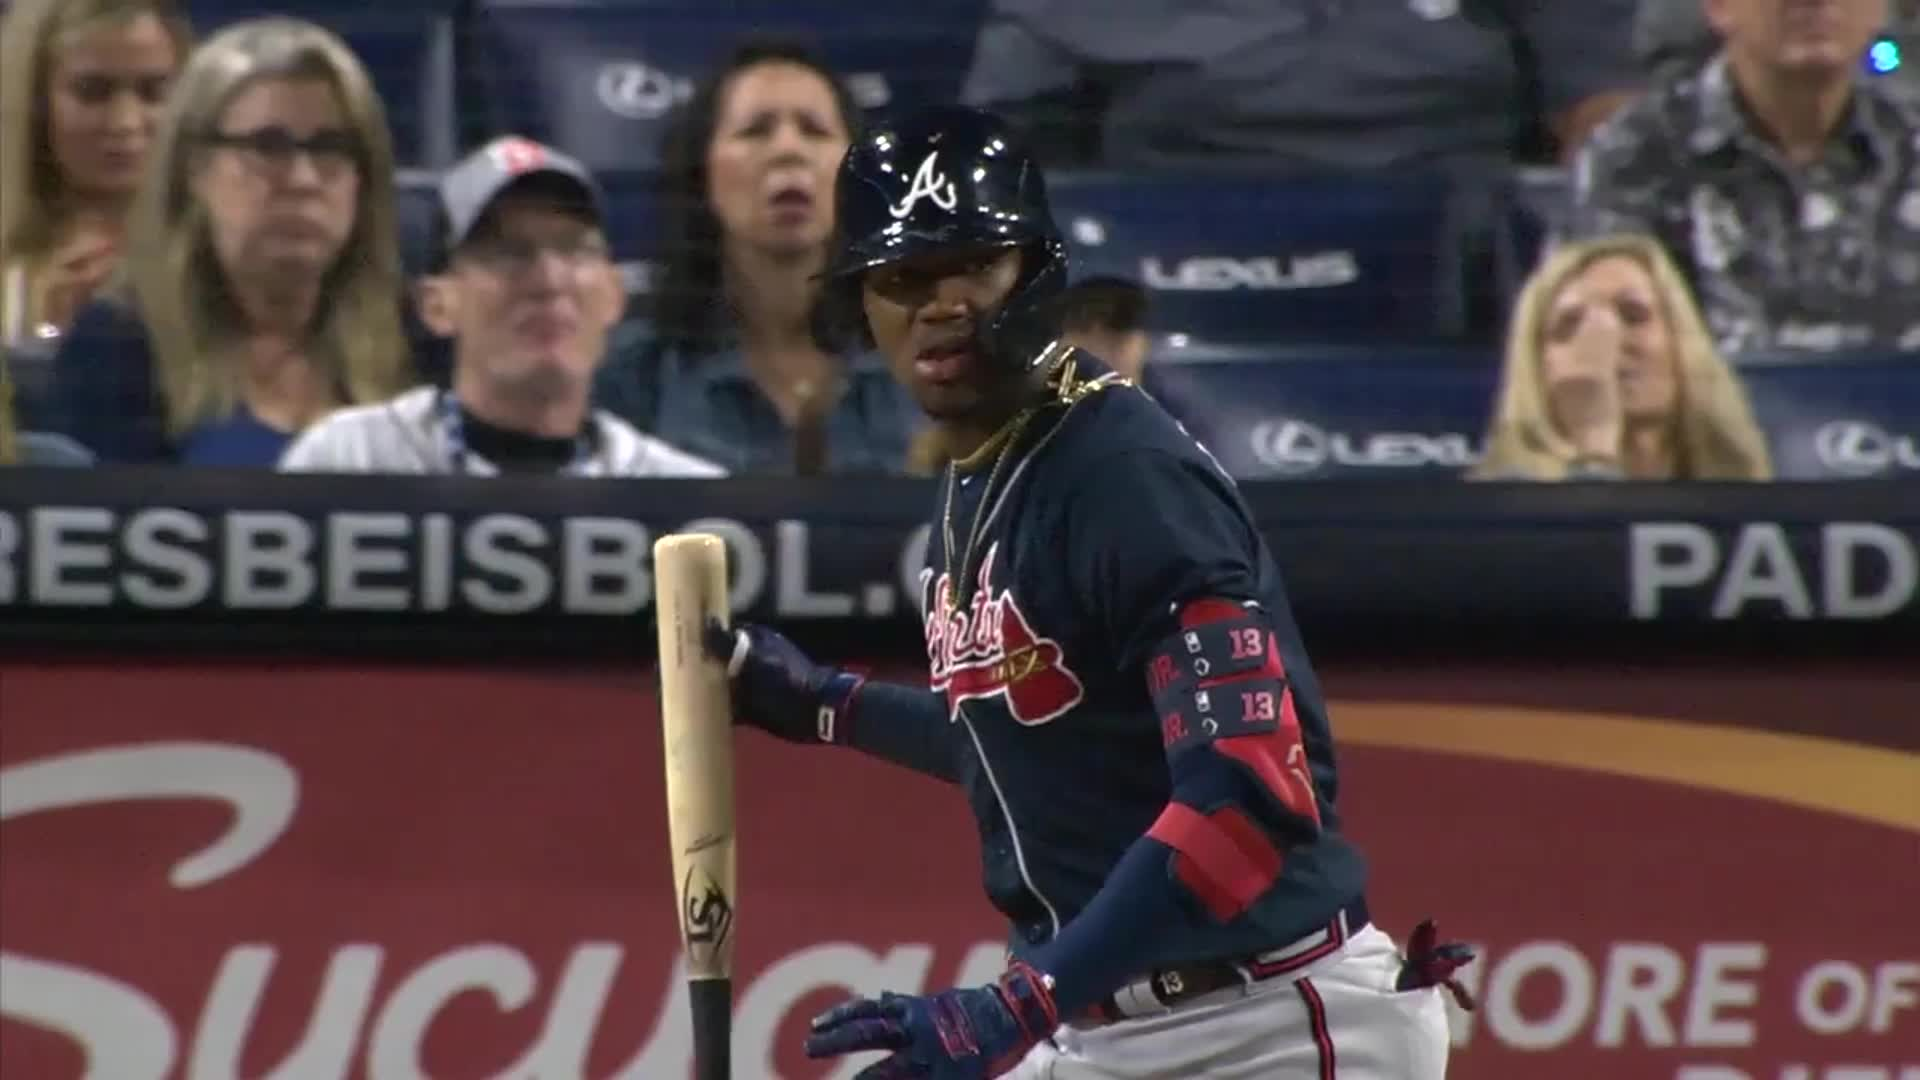 atlanta, baseball, braves, Ronald Acuña Jr. bat drop after 455 ft home run. GIFs